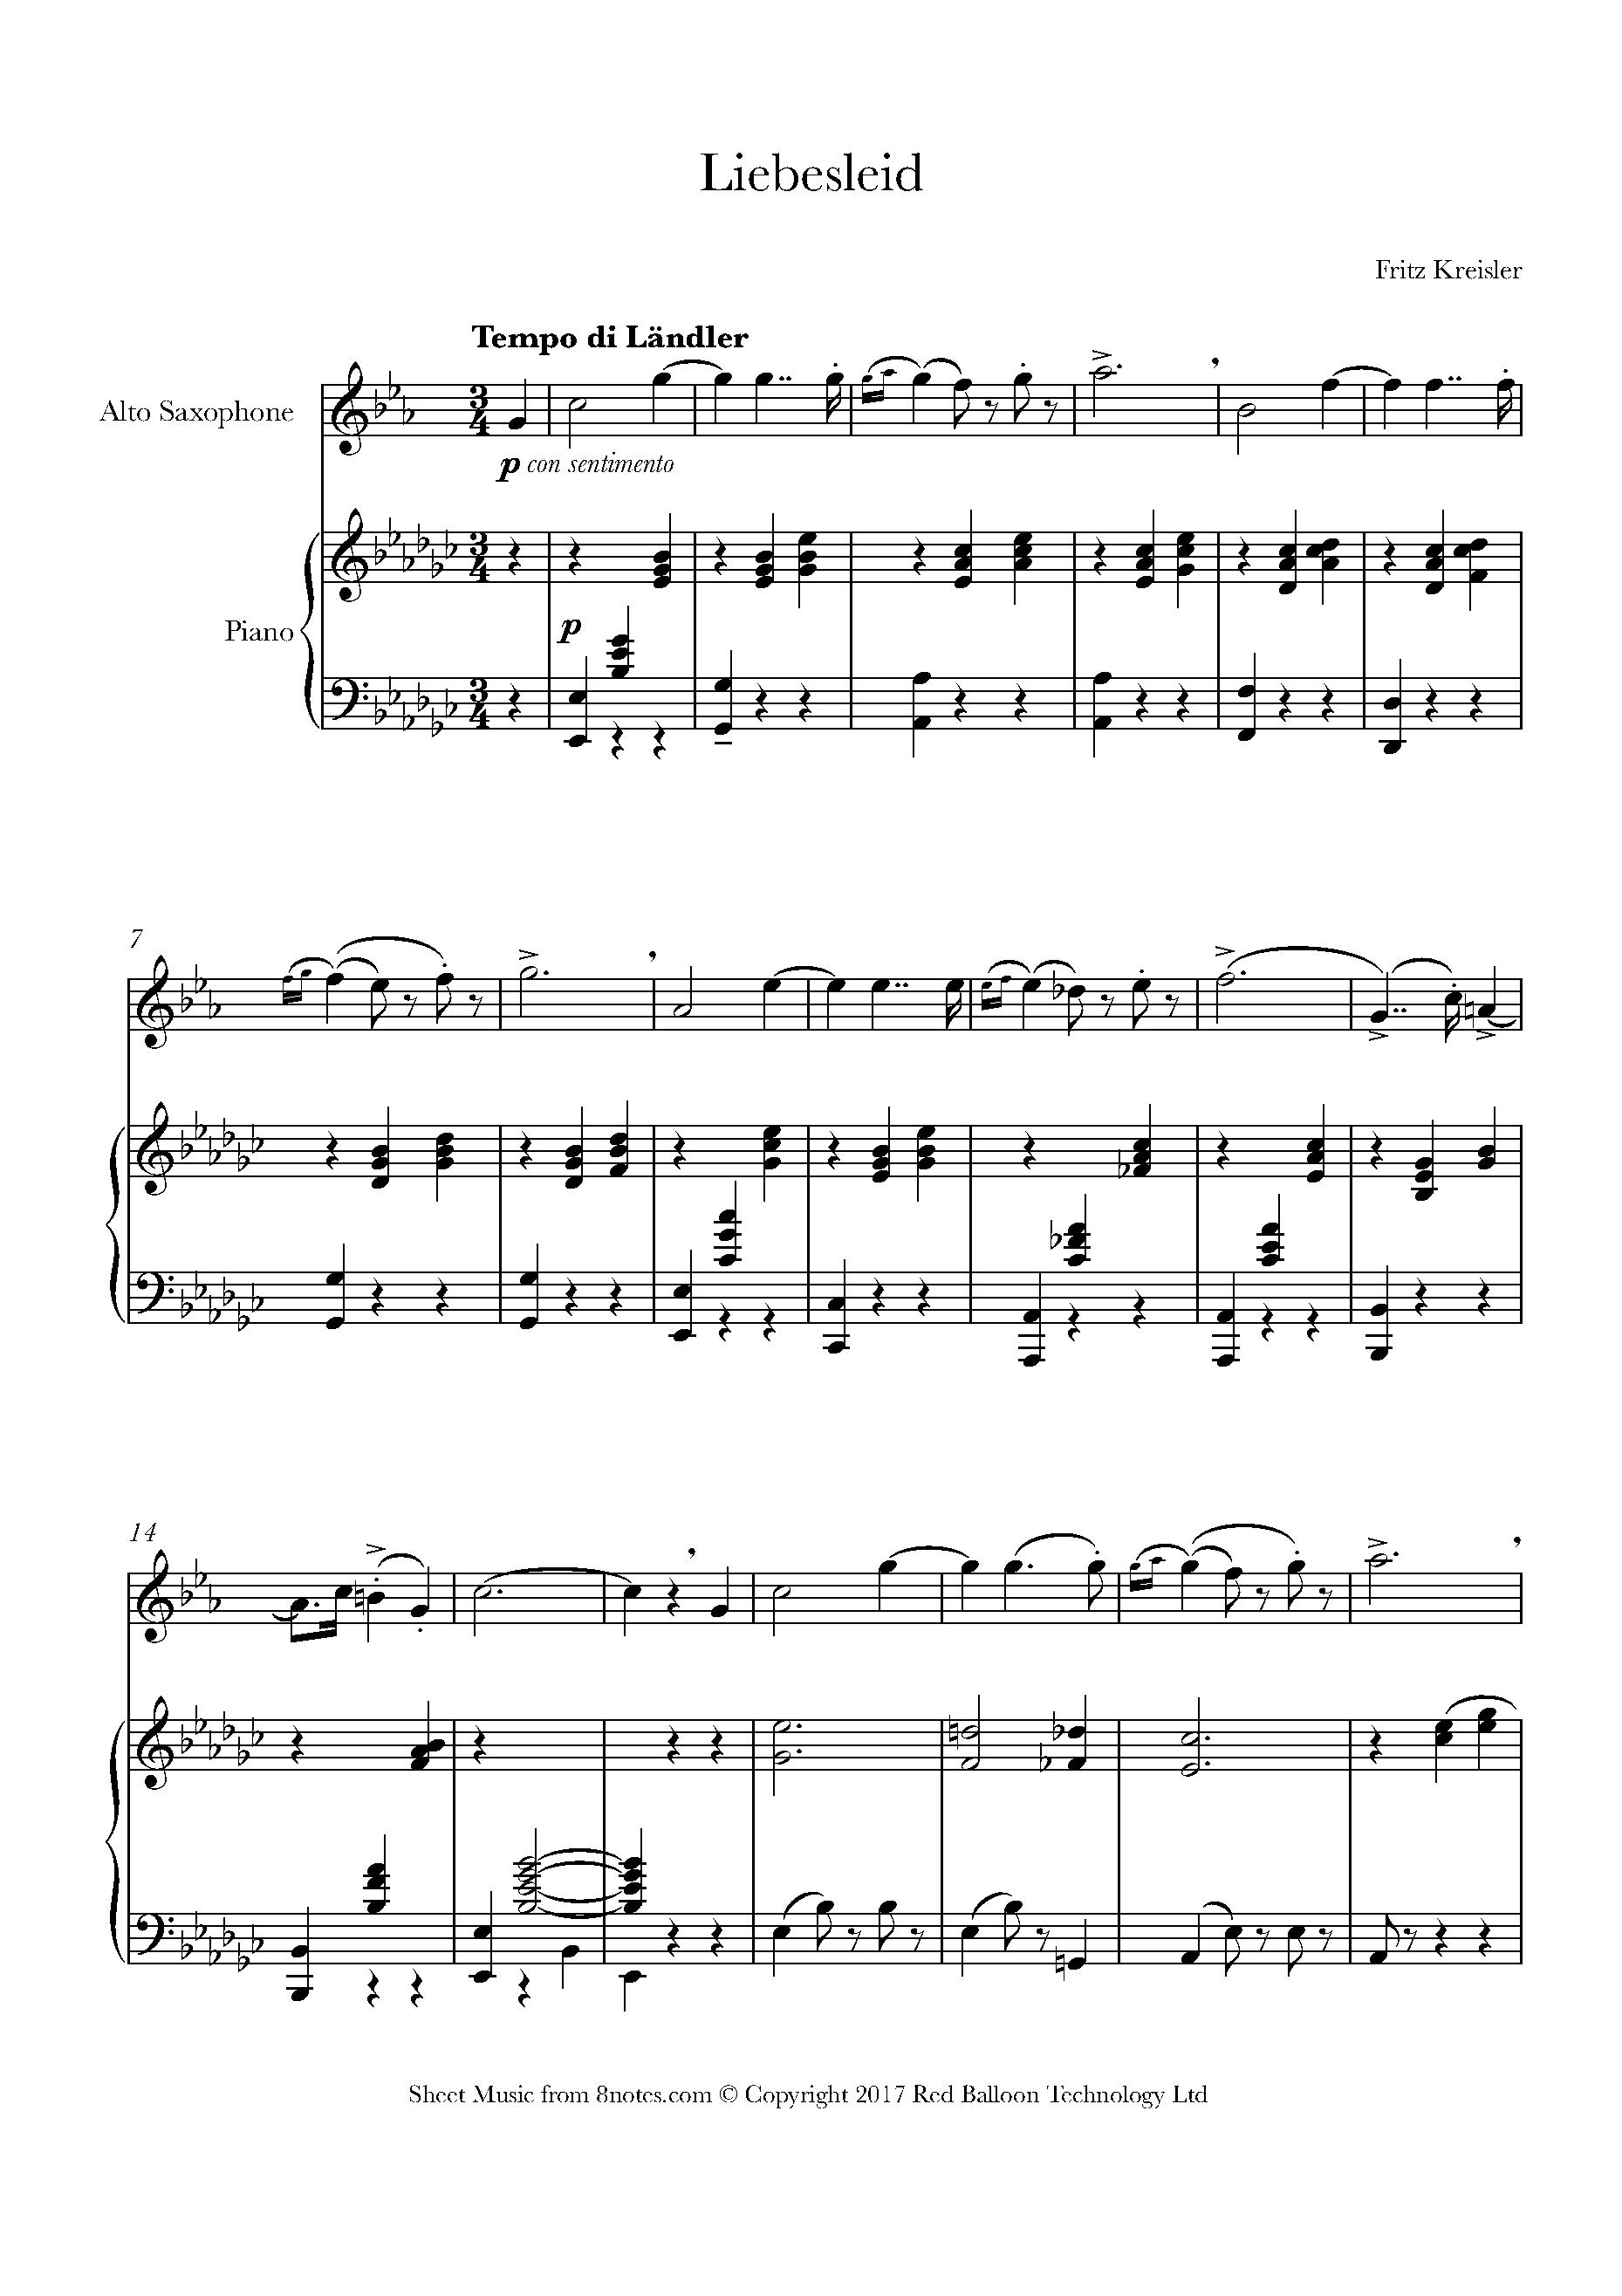 Free Alto Sax Sheet Music, Lessons & Resources - 8notes com